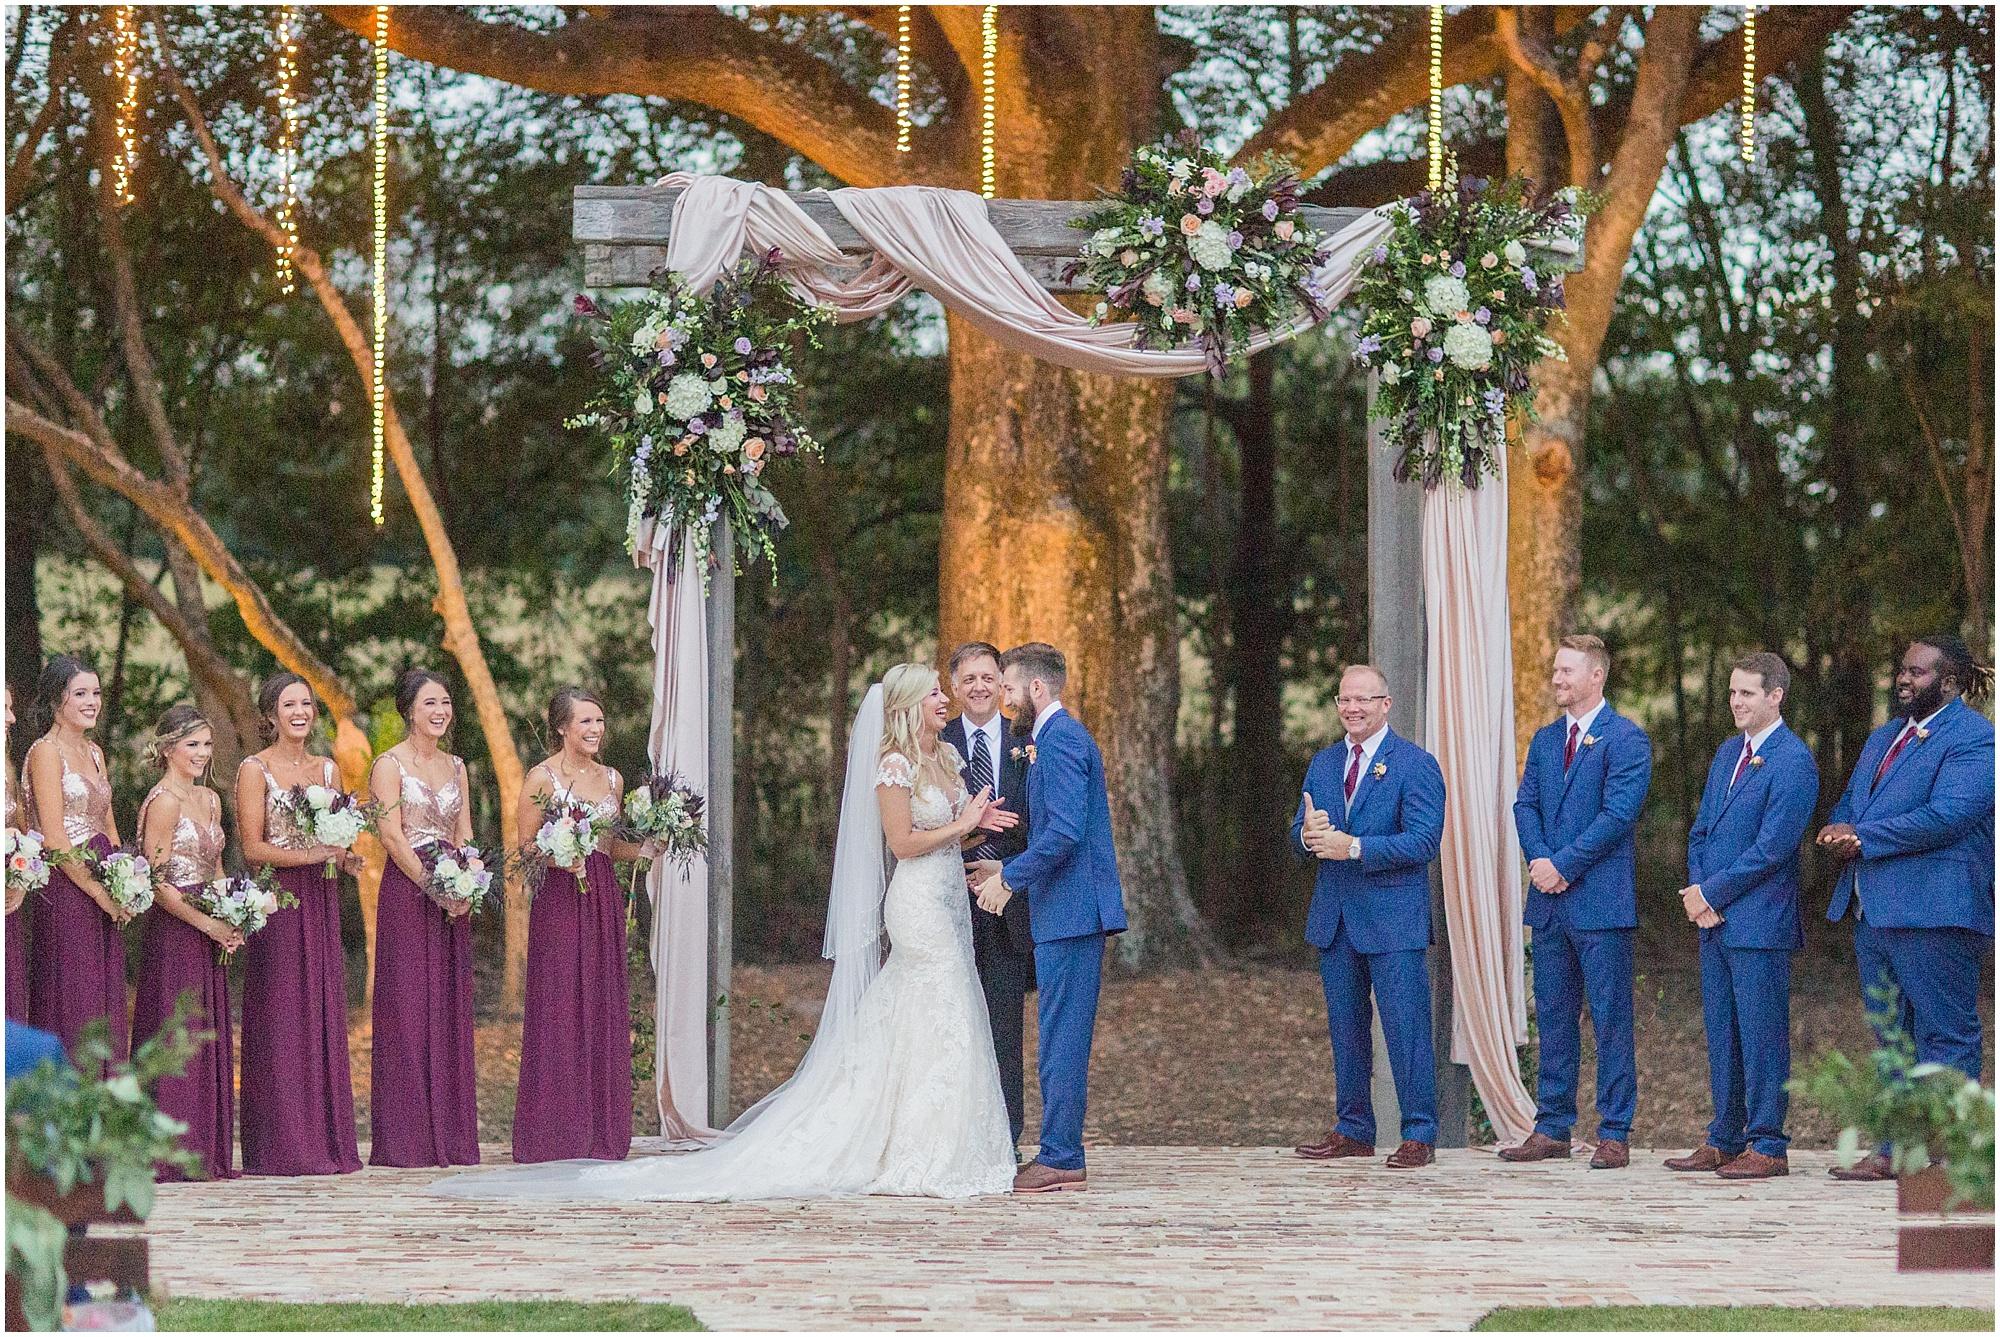 fall-wedding-bridlewood-of-madison-mississippi_0060.jpg